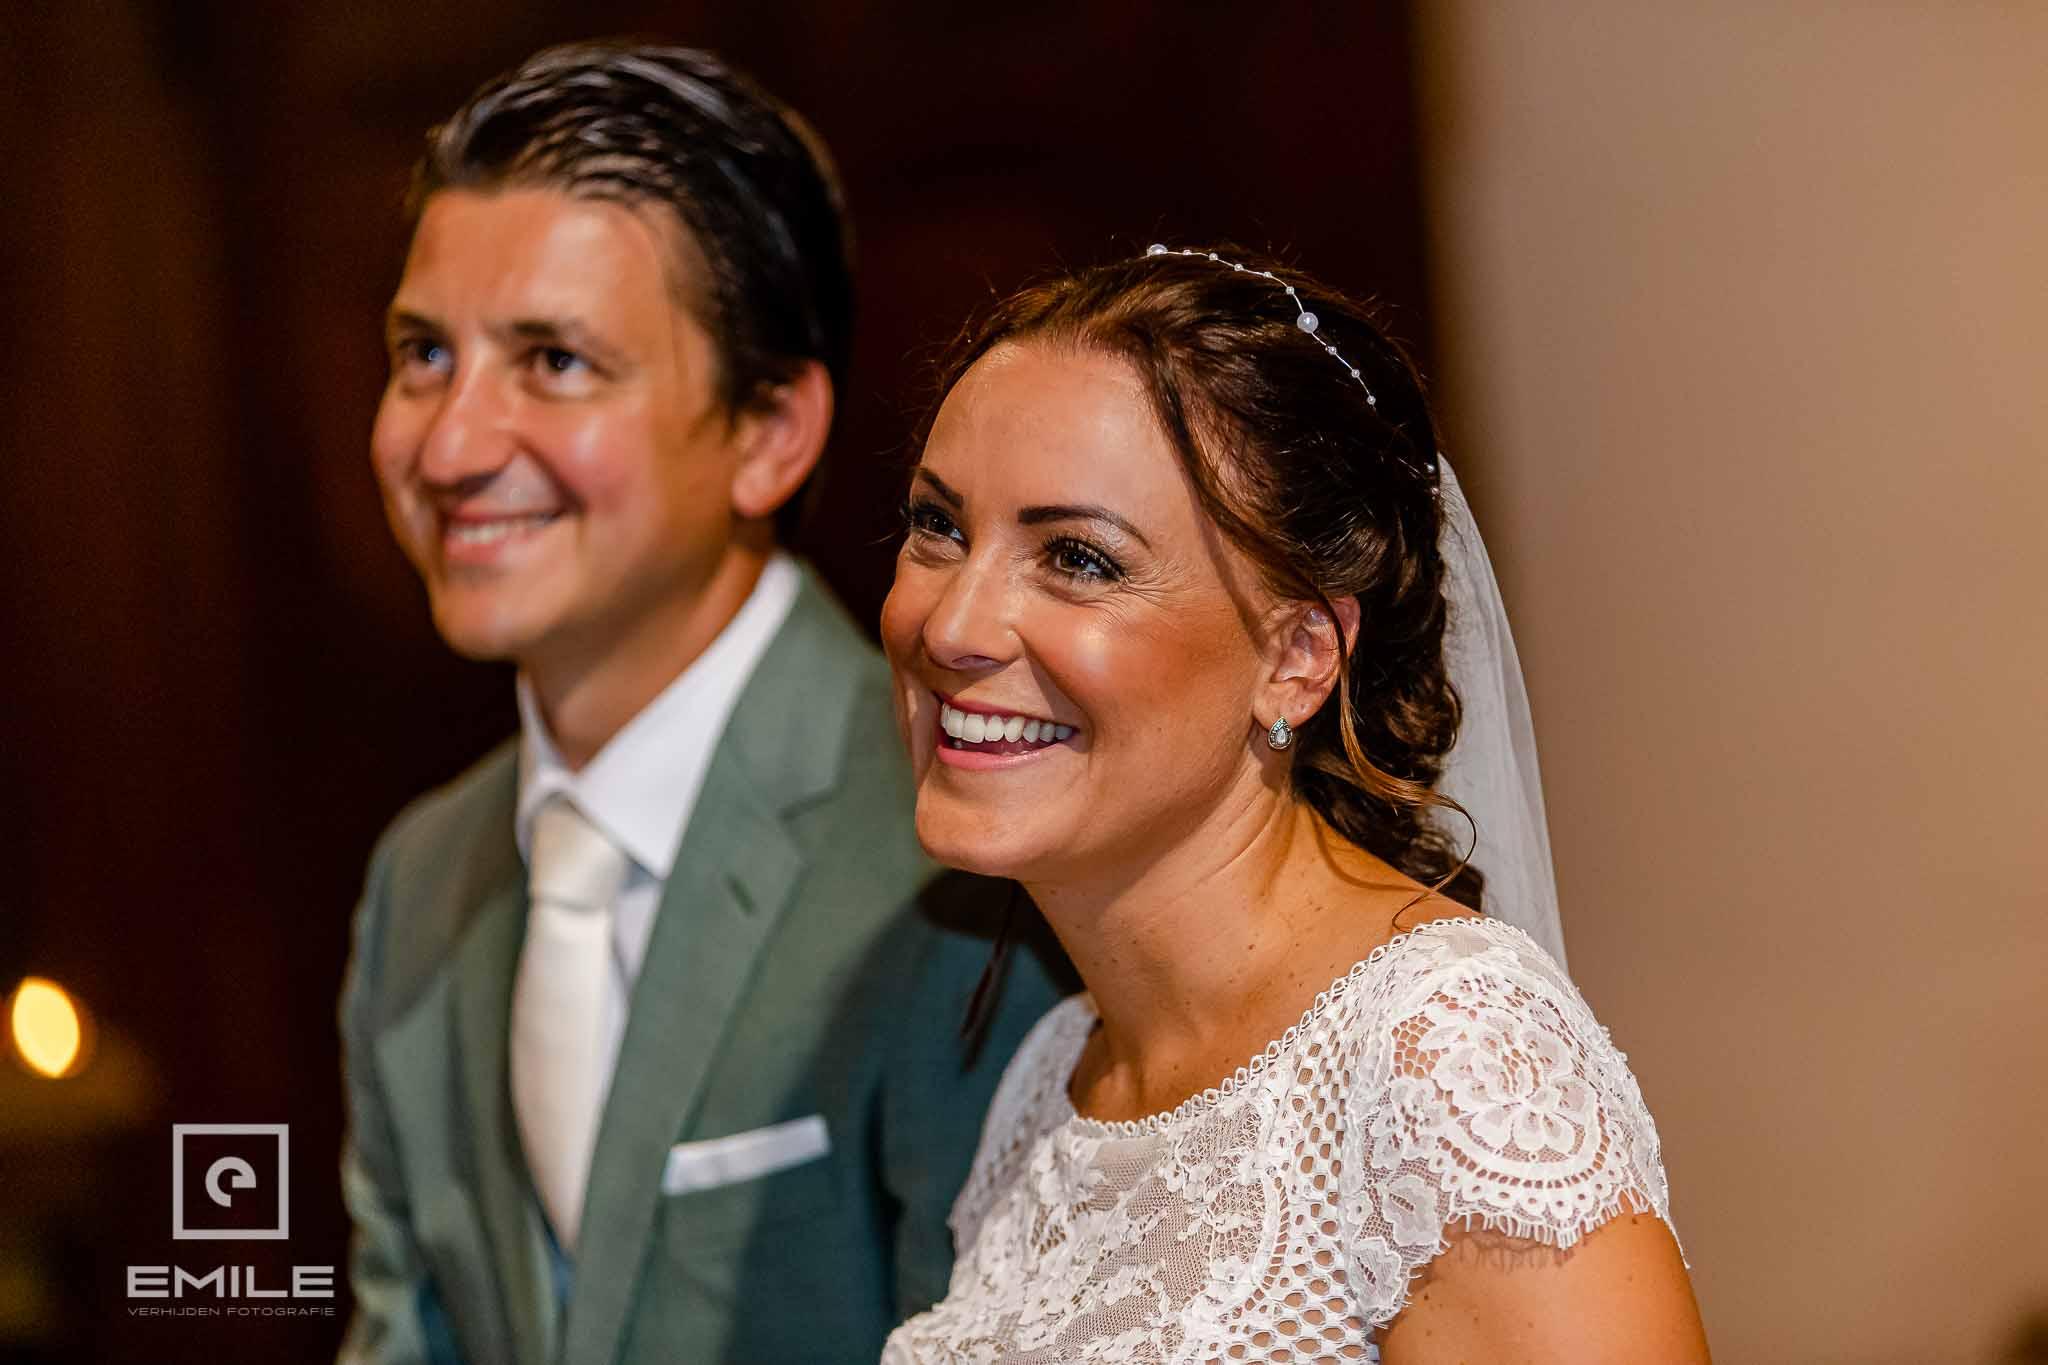 Lachende bruid in de kerk - Destination wedding San Gimignano - Toscane Italie - Iris en Job